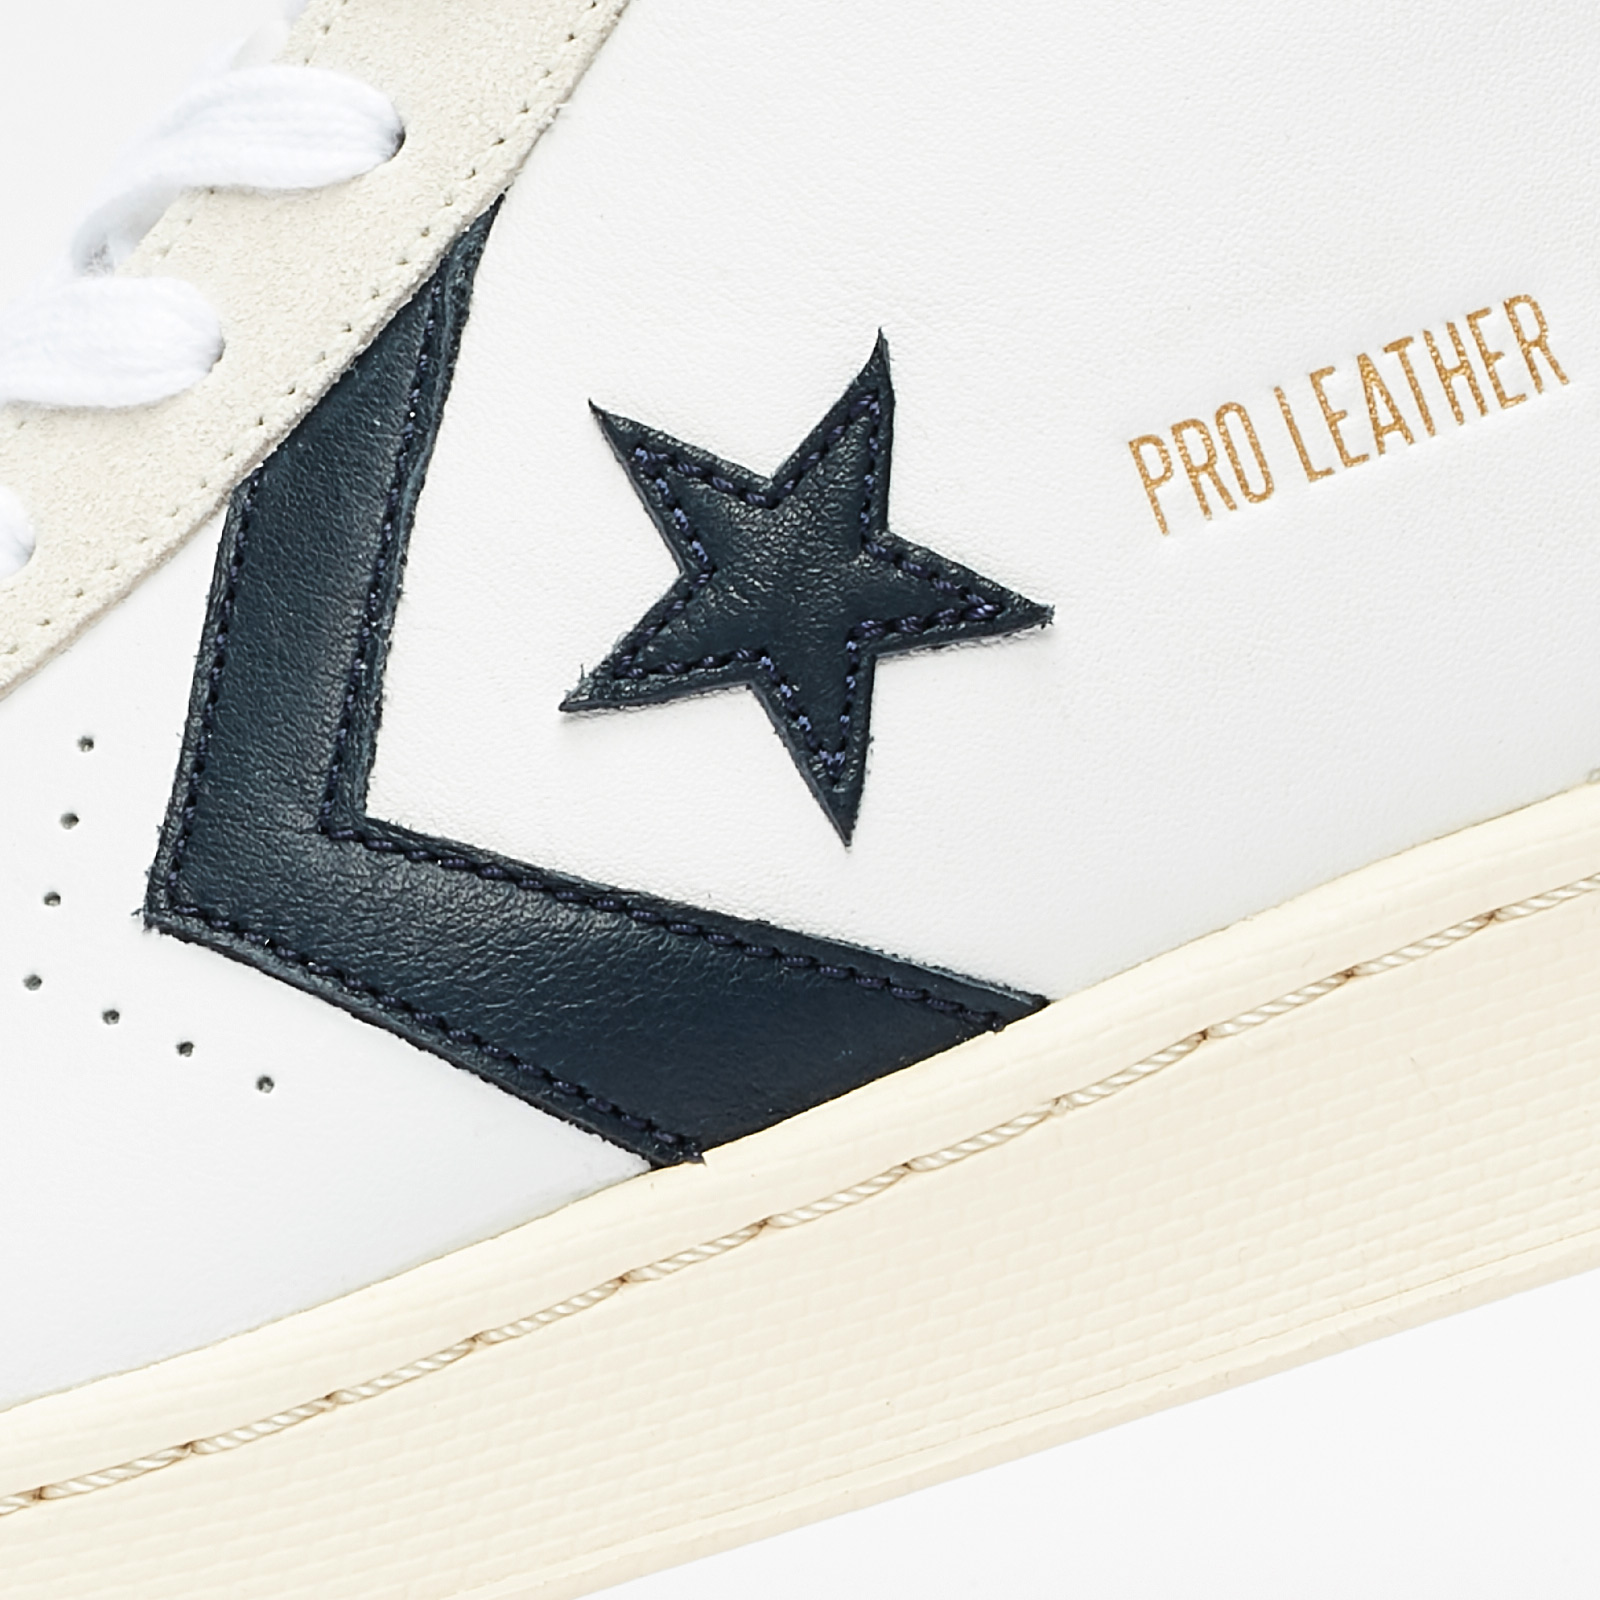 Converse Pro Leather OG Mid - 167968c - Sneakersnstuff ...